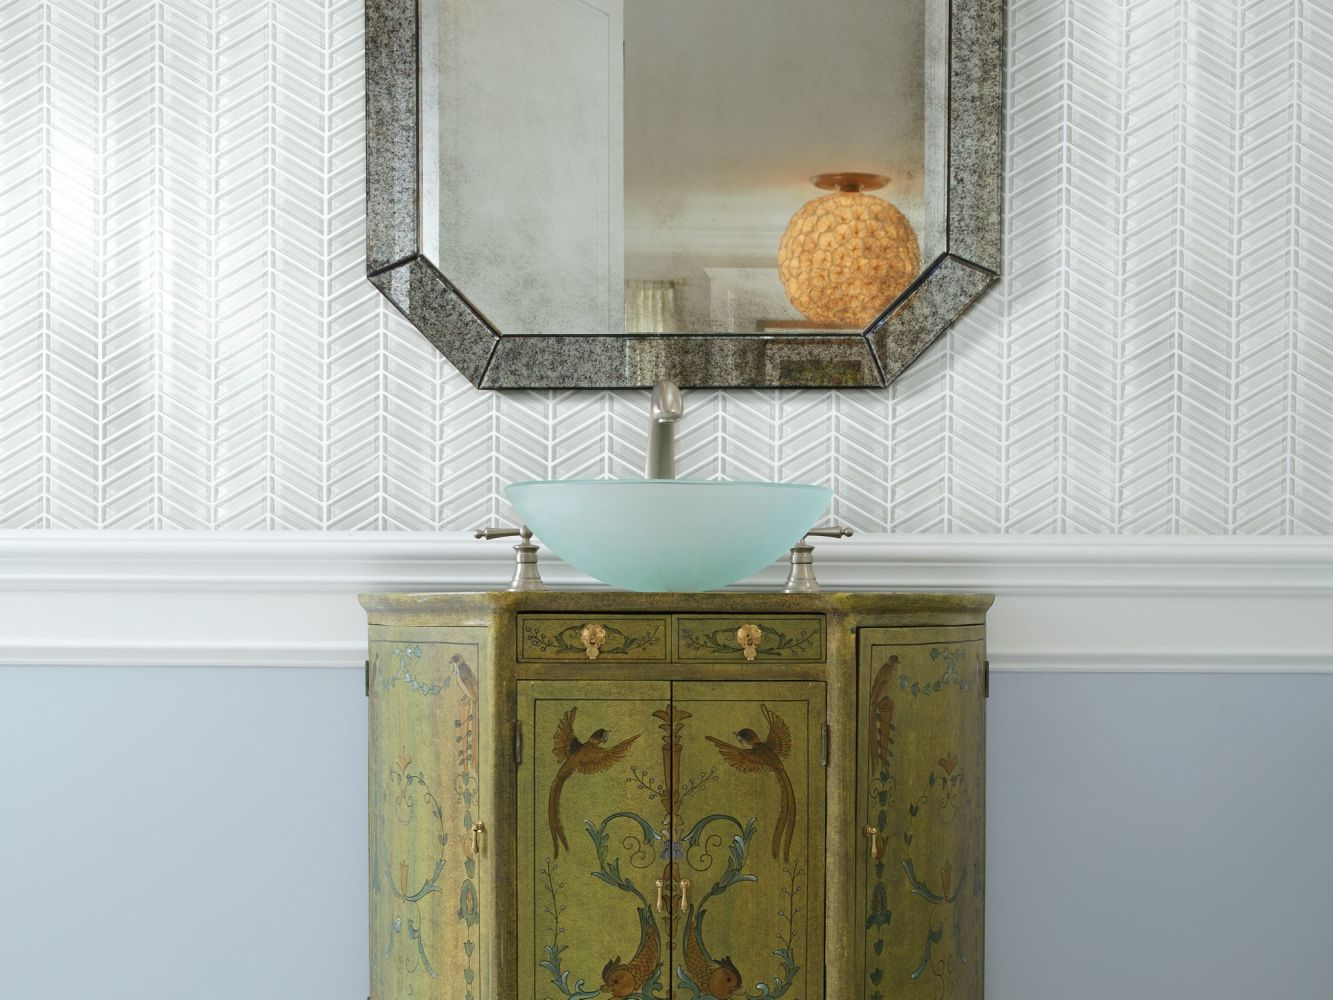 Shaw Floors Home Fn Gold Ceramic Principal Chevron Glass Mo Ice 00100_TG78B